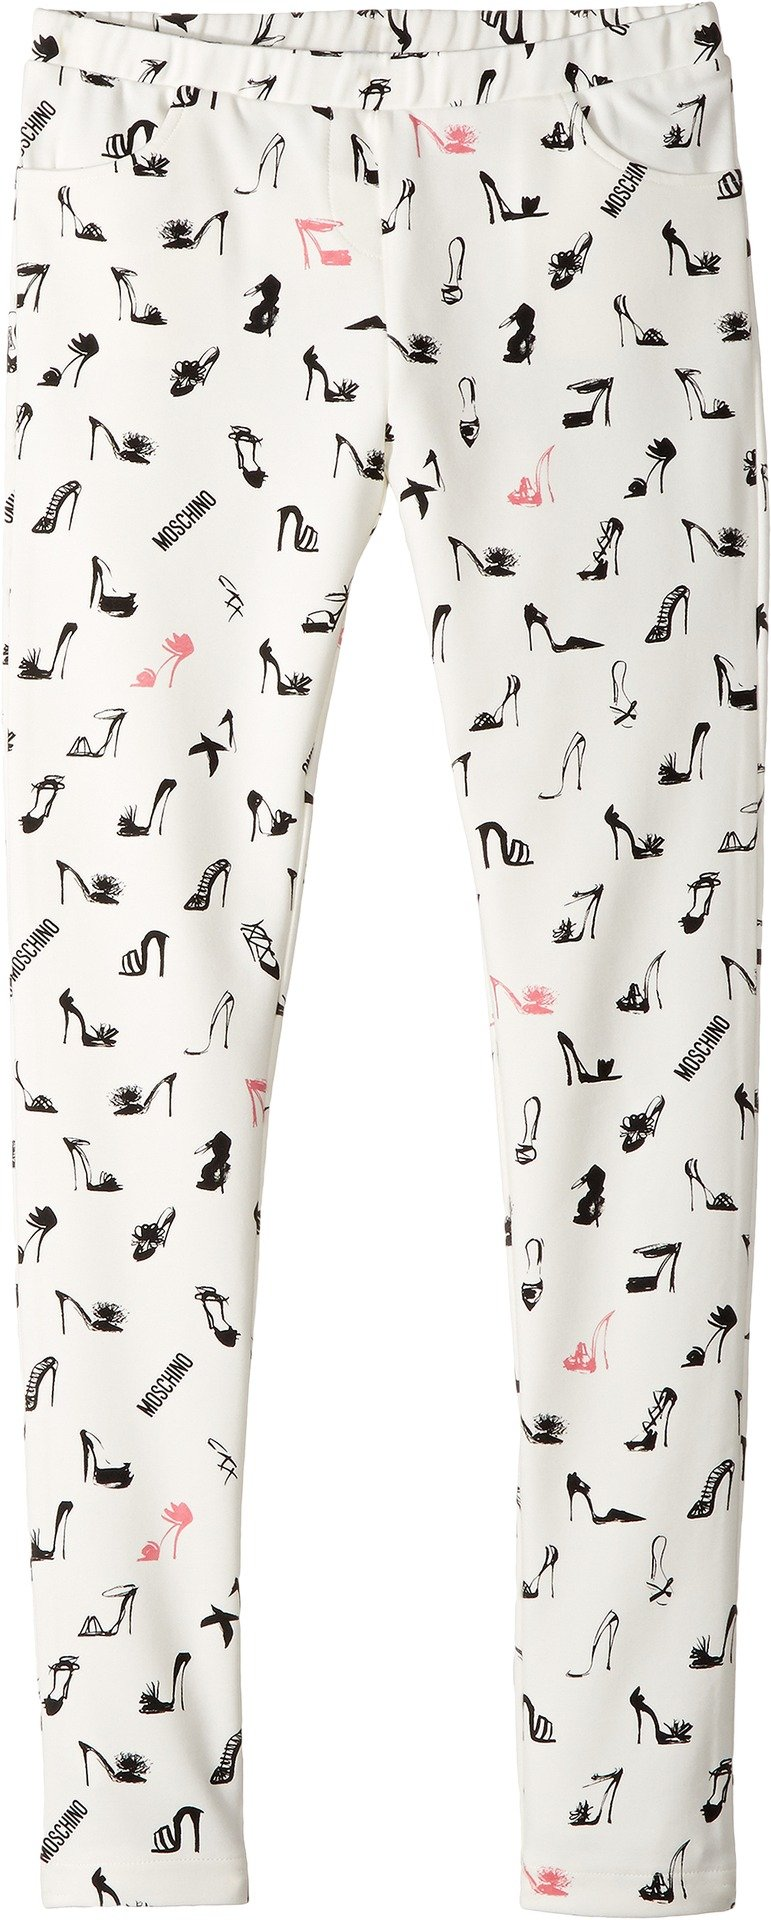 Moschino Kids Girl's All Over High Heel Print Pants (Big Kids) White/Multi 10 Big Kids